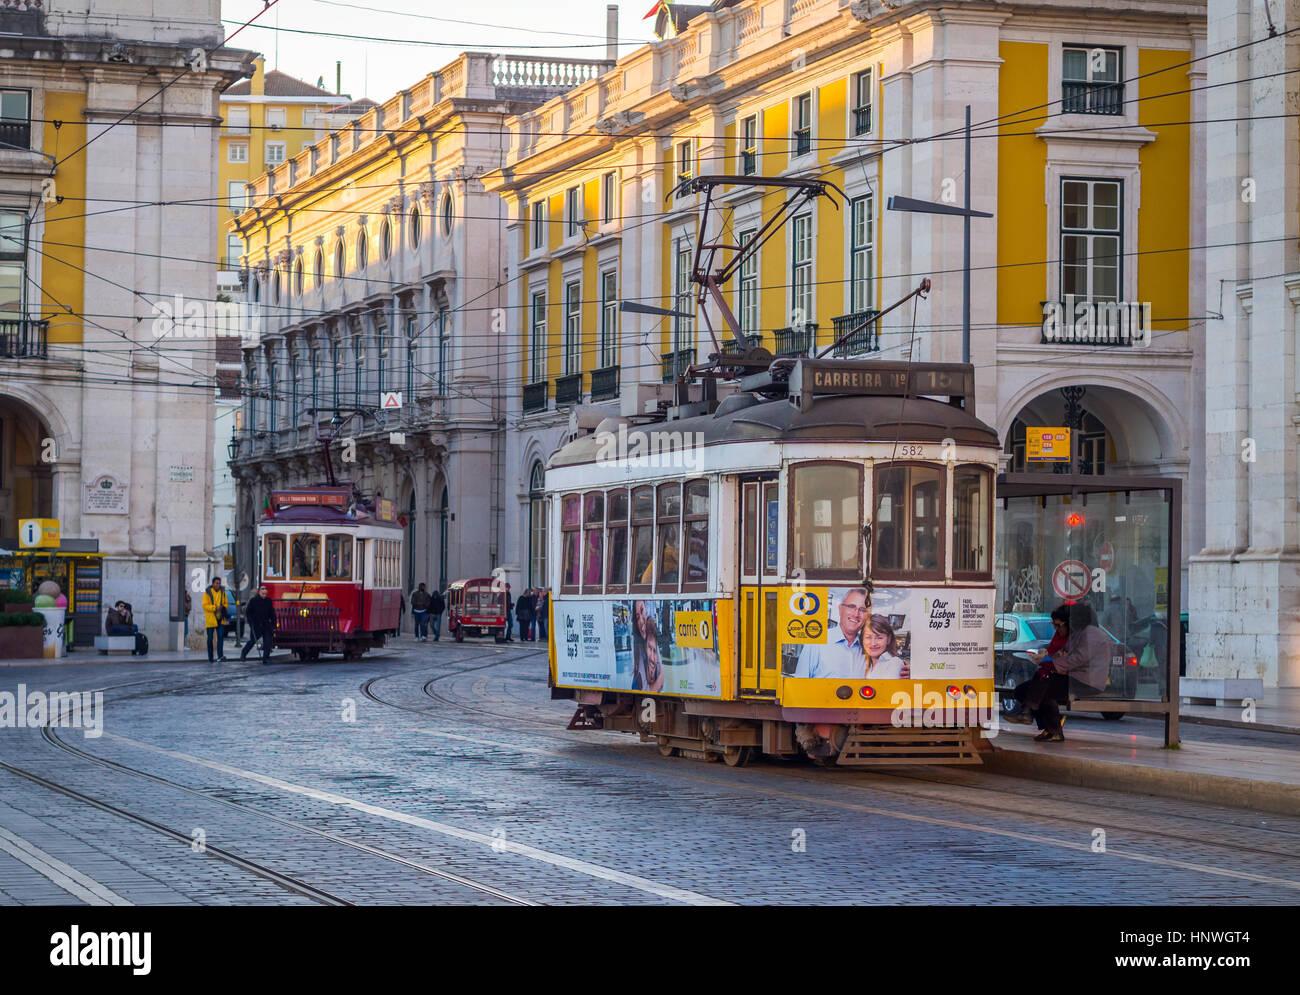 Lissabon, PORTUGAL - 10. Januar 2017: Alte Straßenbahnen auf der Praça Comercio (Commerce Square) in Lissabon, Stockbild